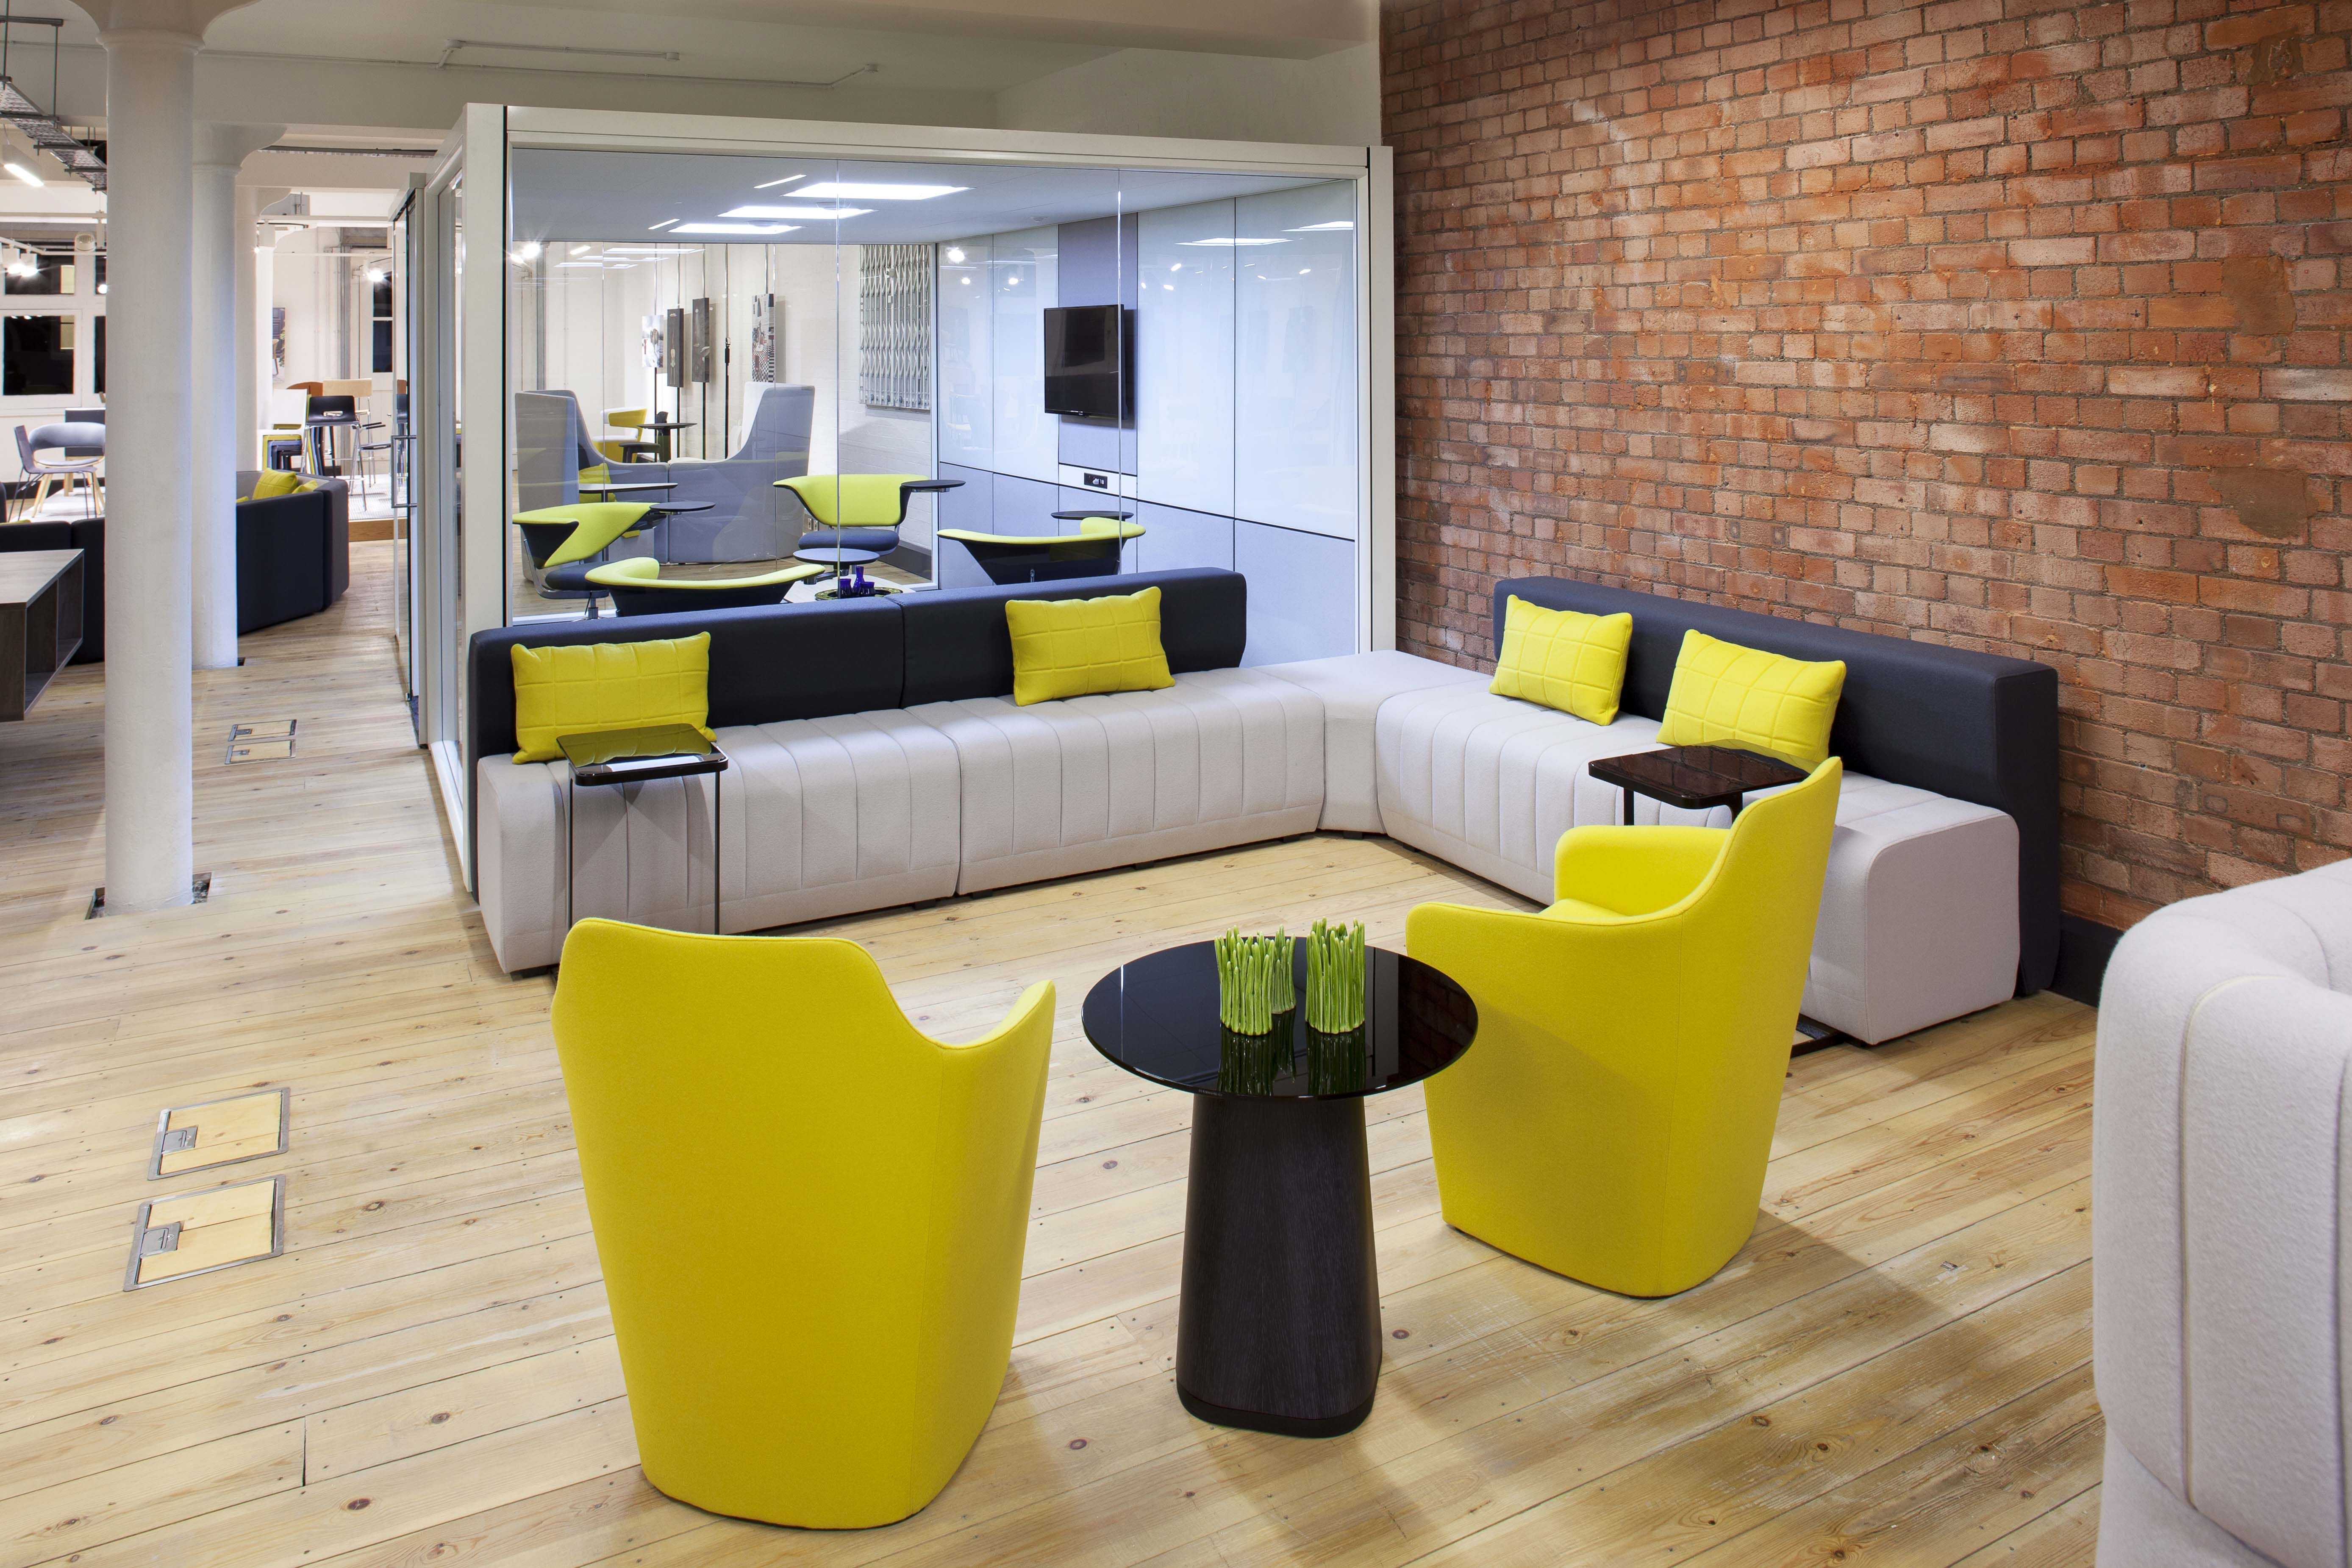 Haven Bench and Venus by Allermuir | design | furniture ...